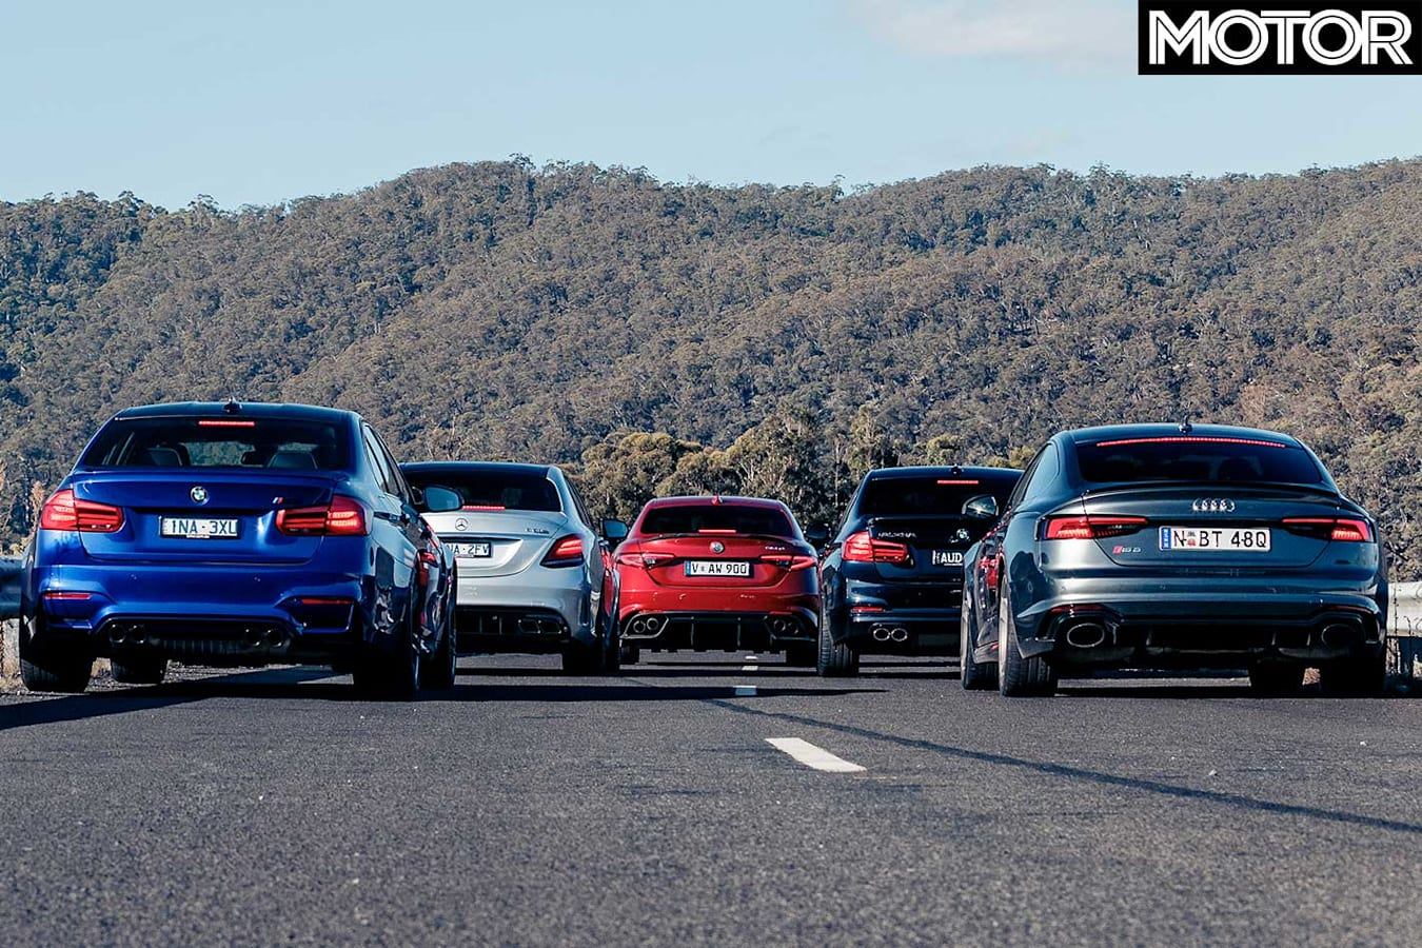 2019 Mercedes AMG C 63 S Vs Audi RS 5 Sportback Vs BMW M 3 Pure Vs Alfa Romeo Giulia Q Vs Alpina B 3 S Specification Comparison Jpg